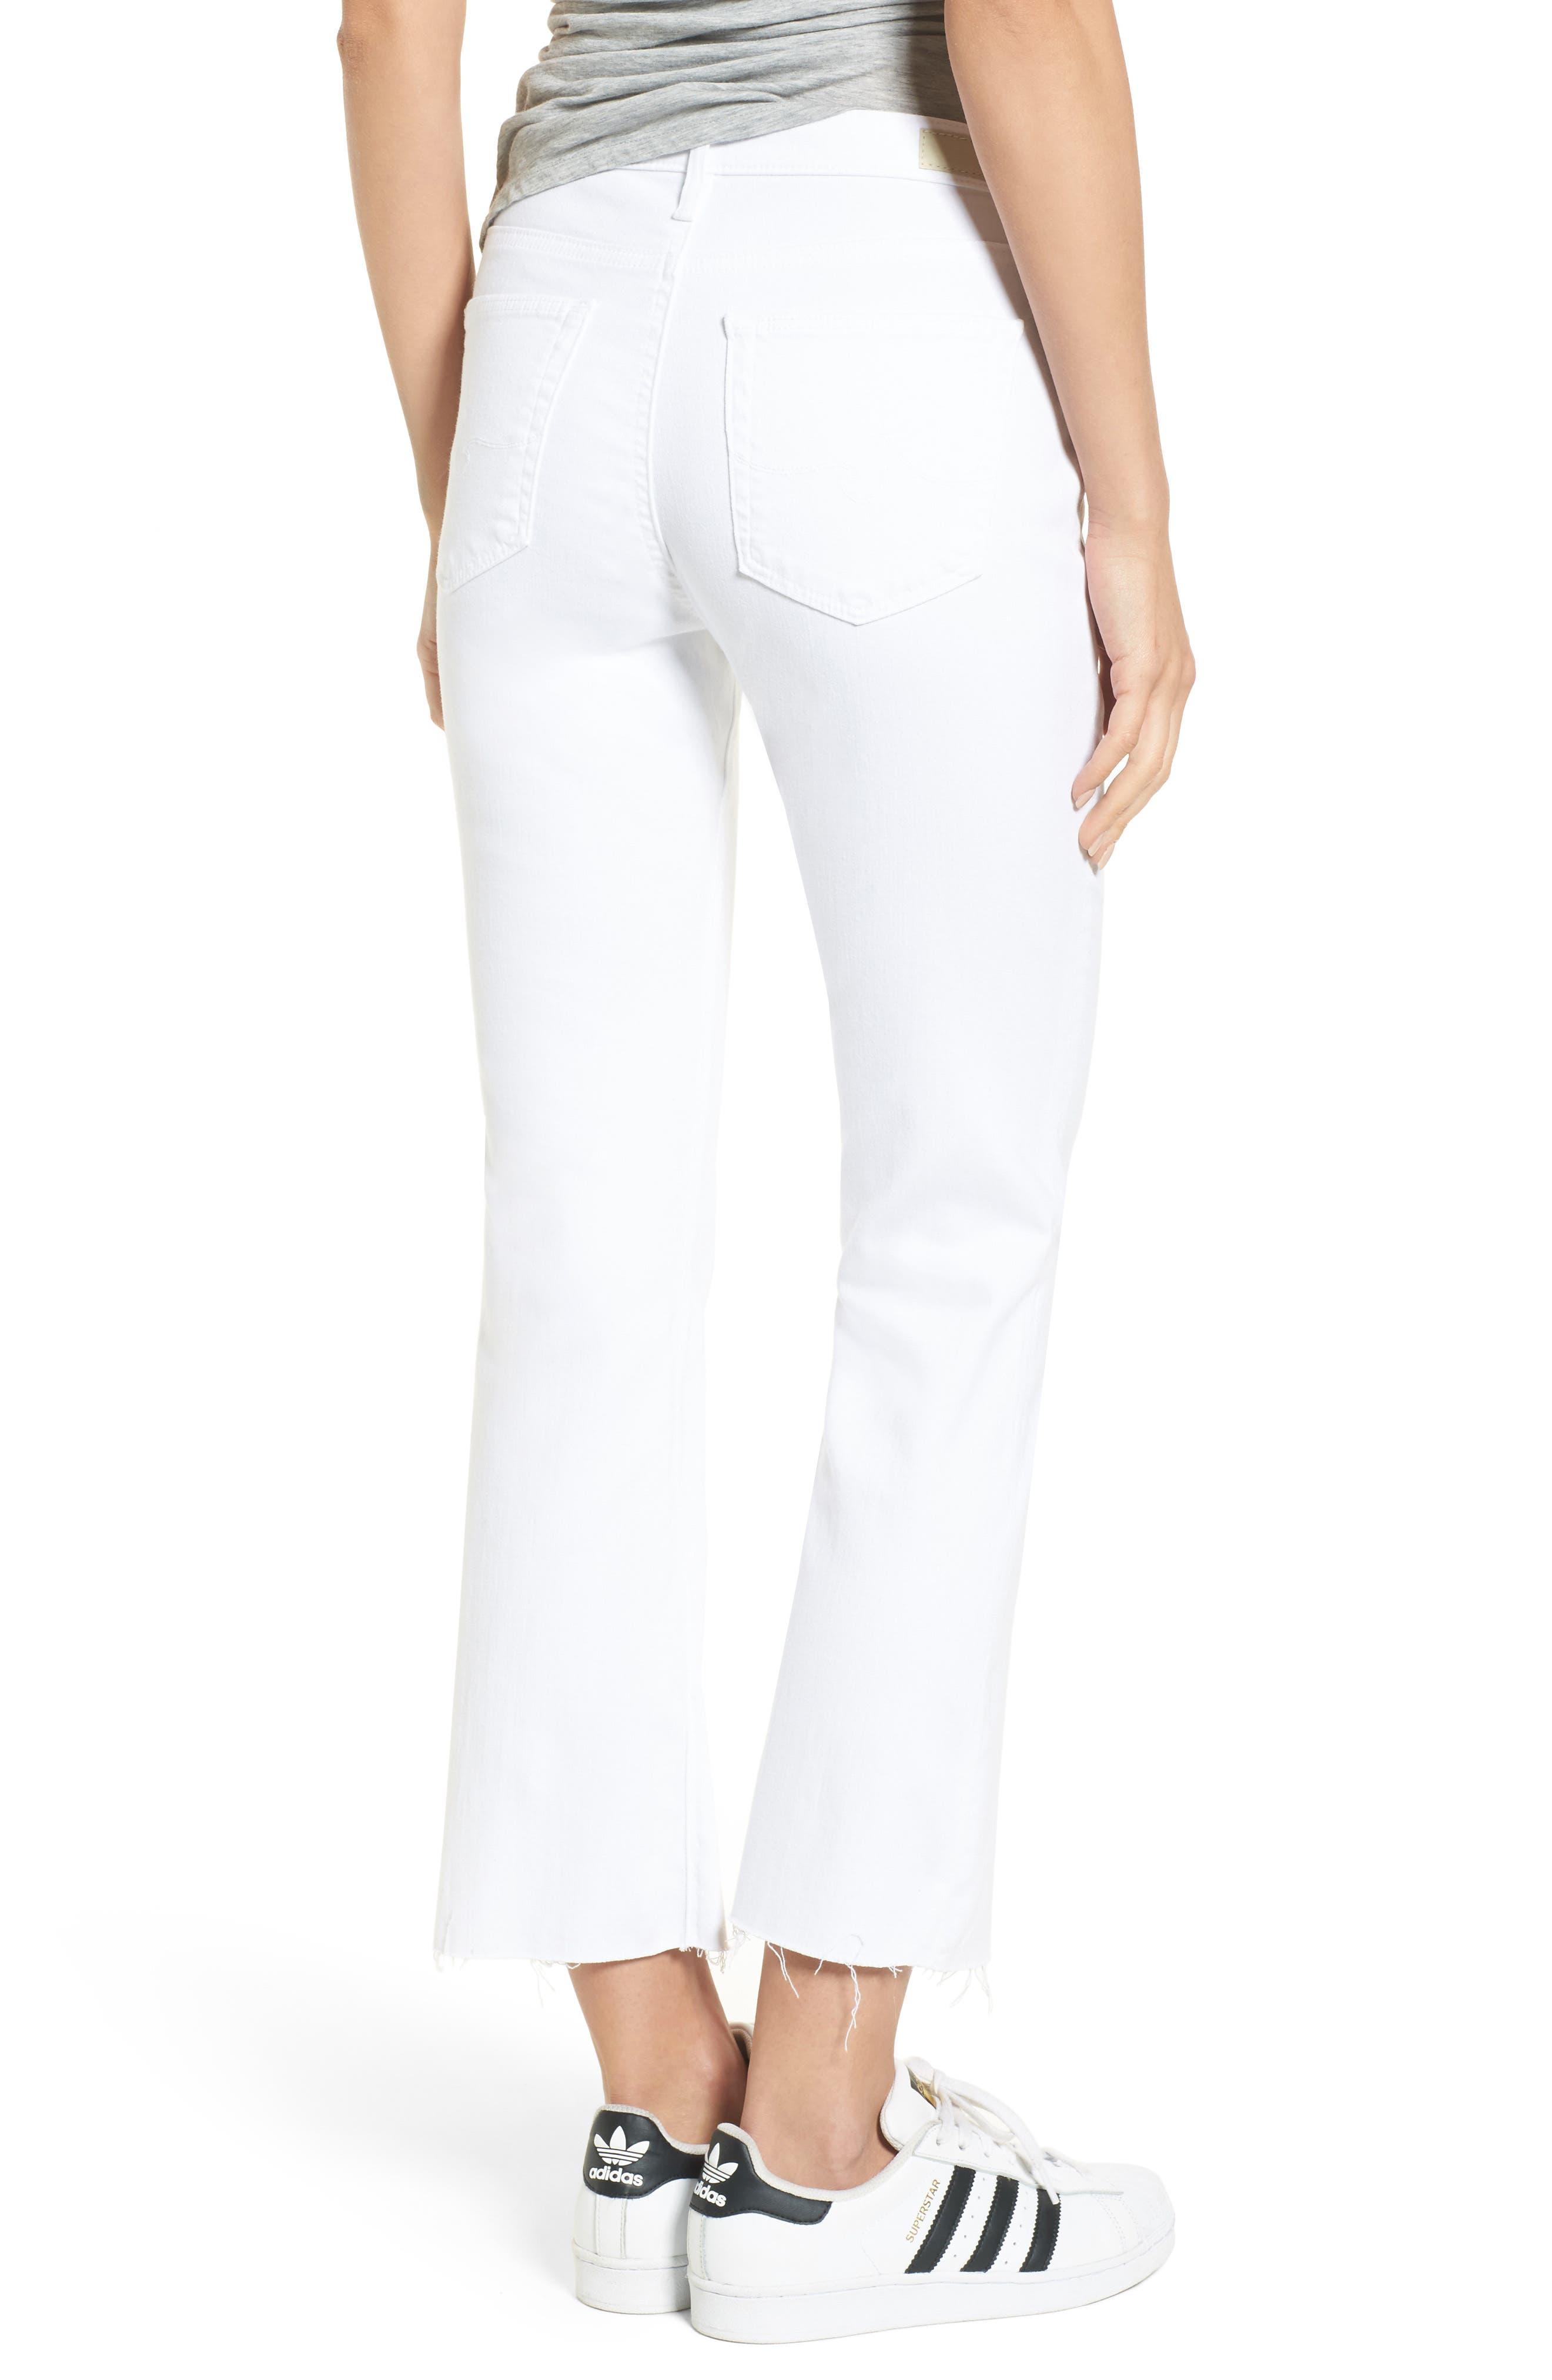 AG, Jodi High Waist Crop Jeans, Alternate thumbnail 2, color, WHITE